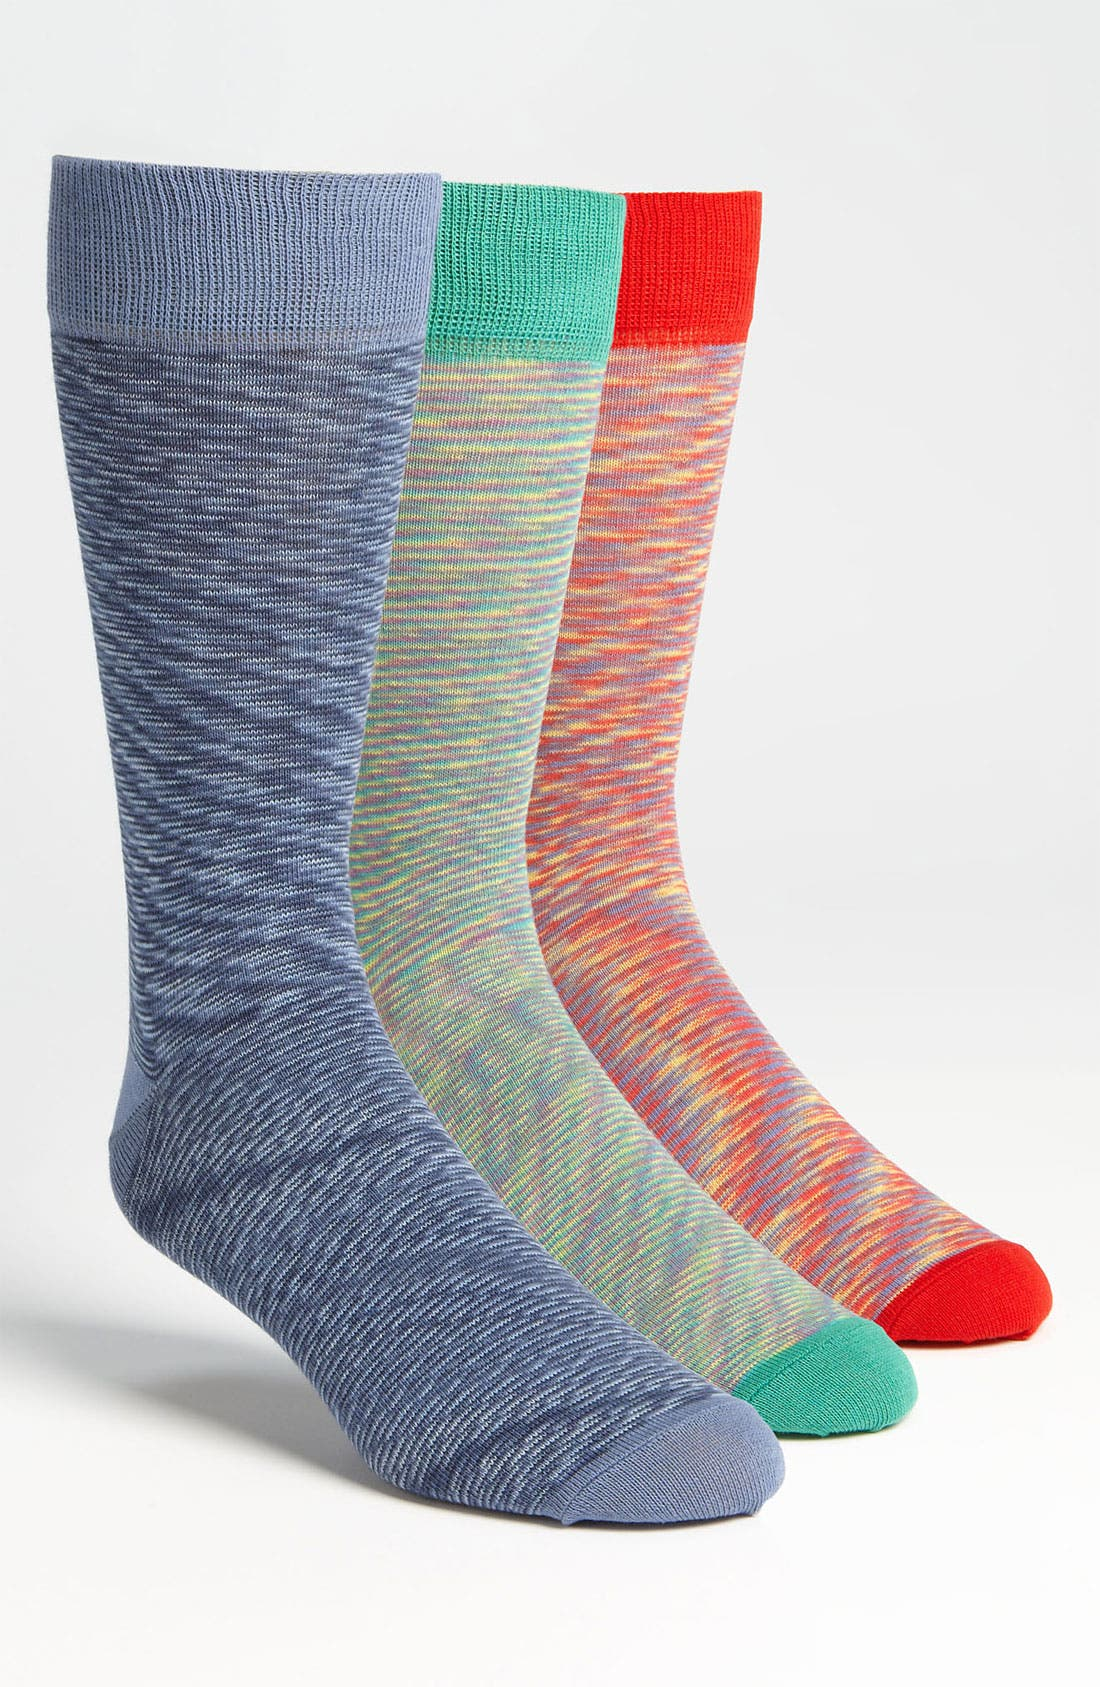 Main Image - Topman 'Summer Space' Socks (3-Pack)